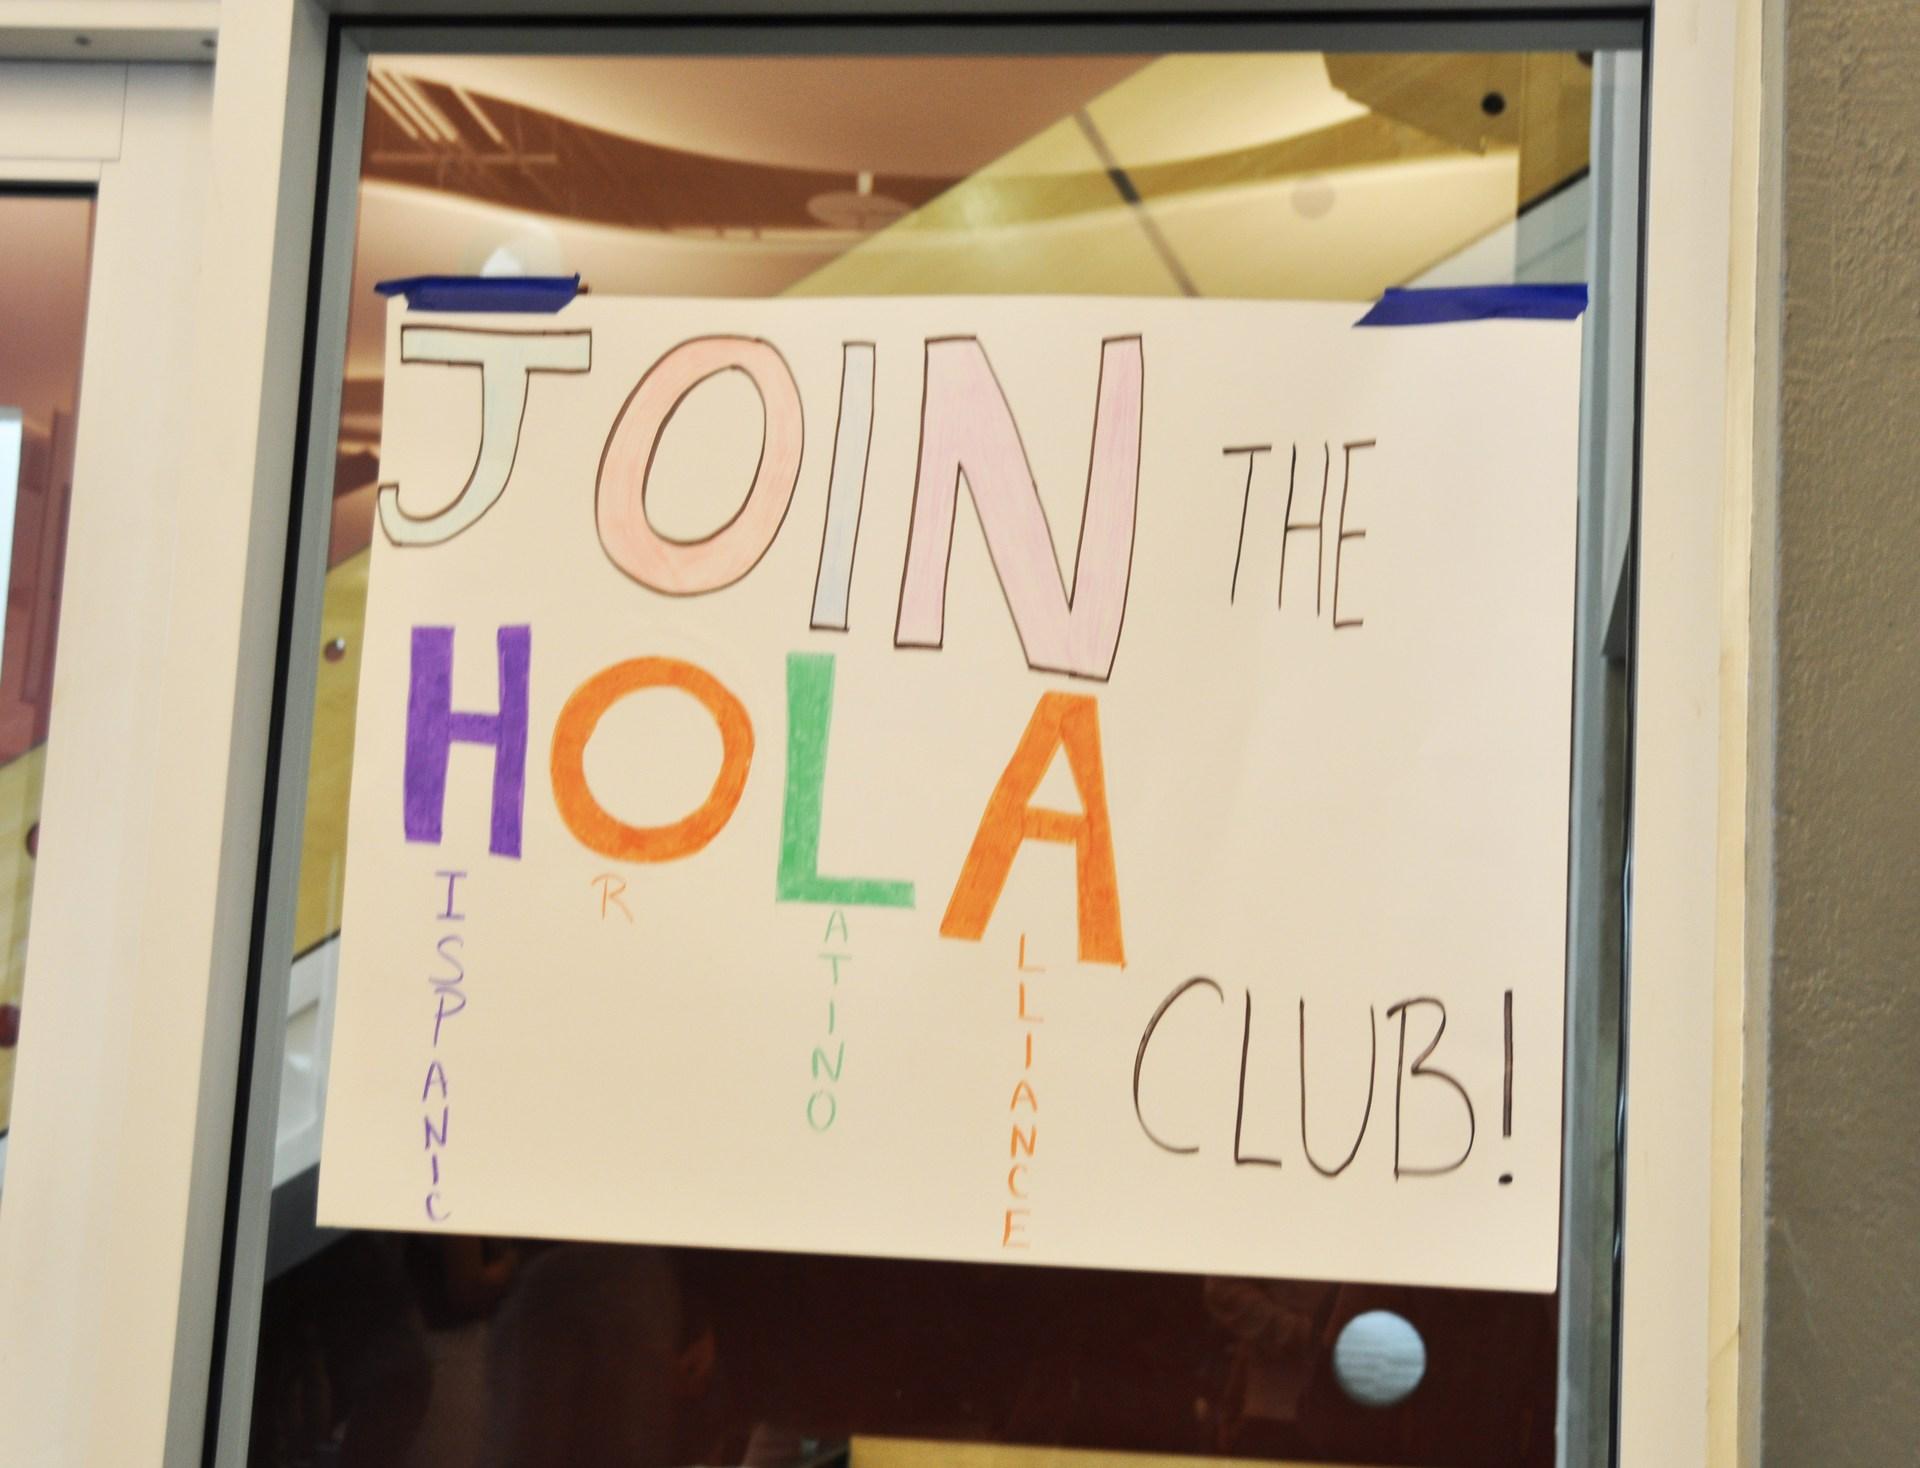 HOLA Club